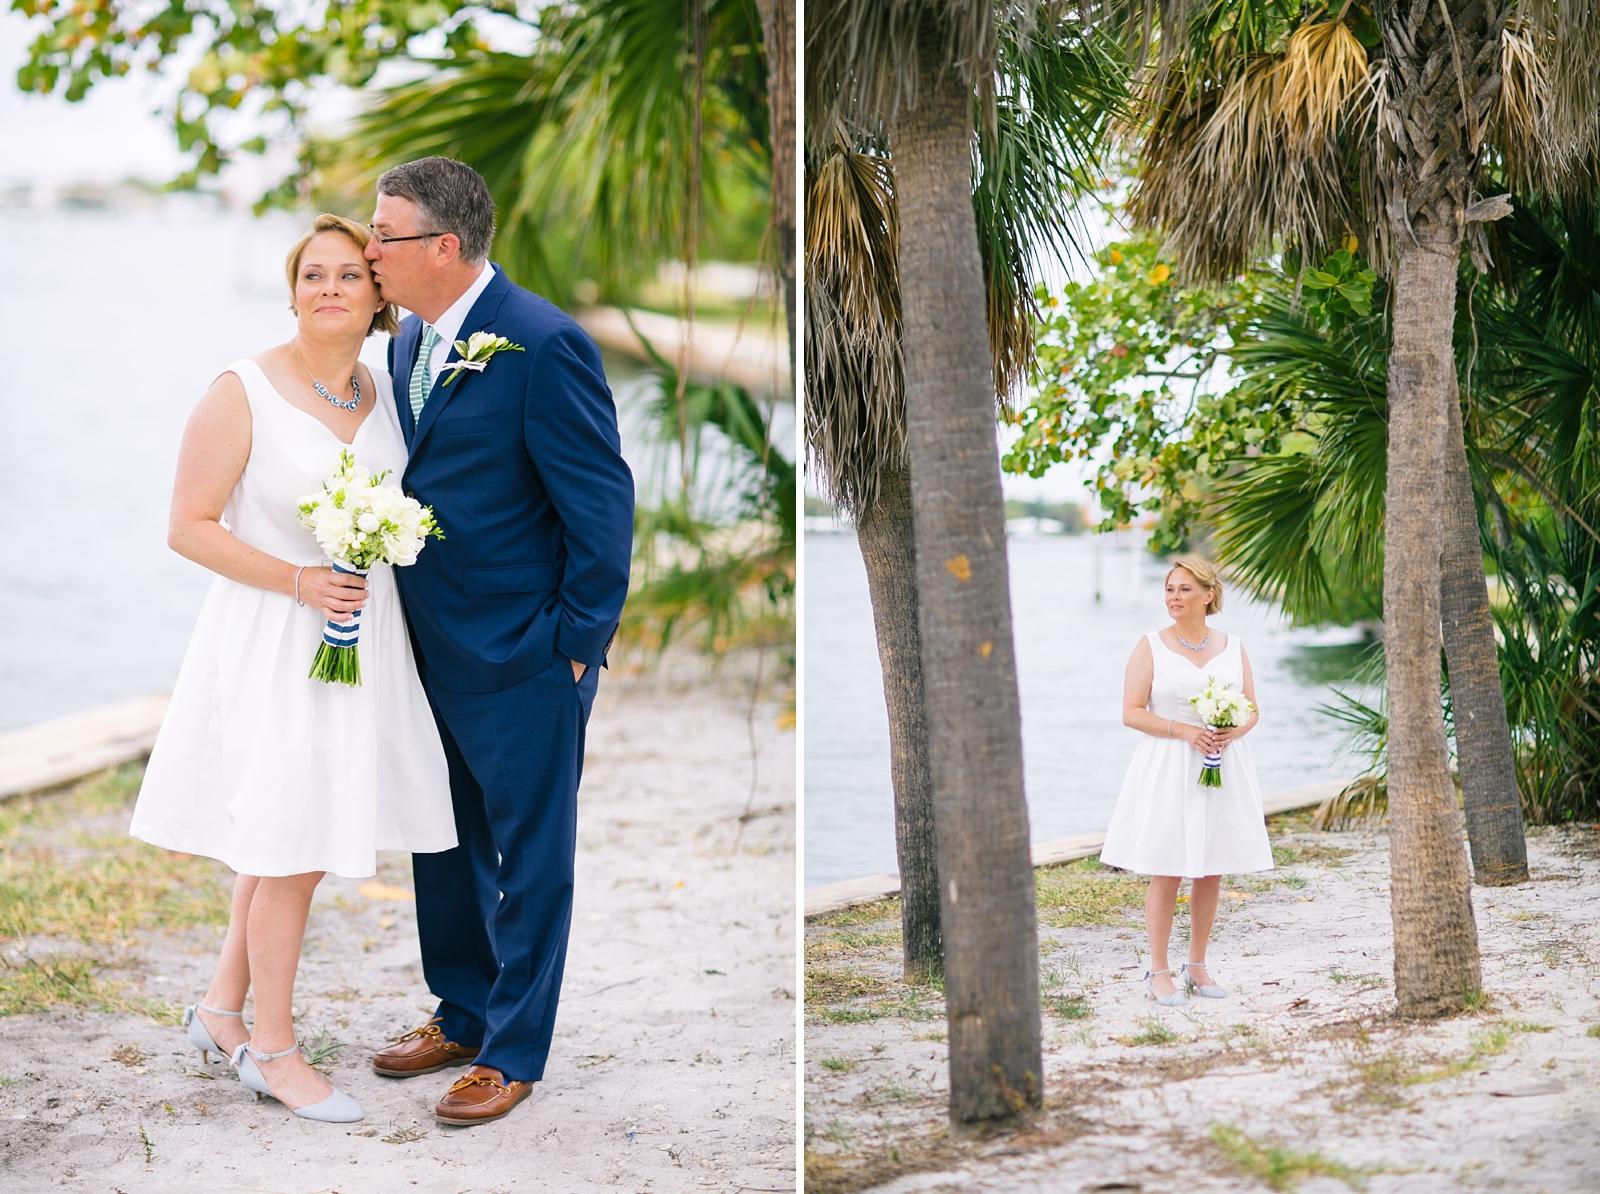 23-los-angeles-wedding-photographer-fort-lauderdale.jpg